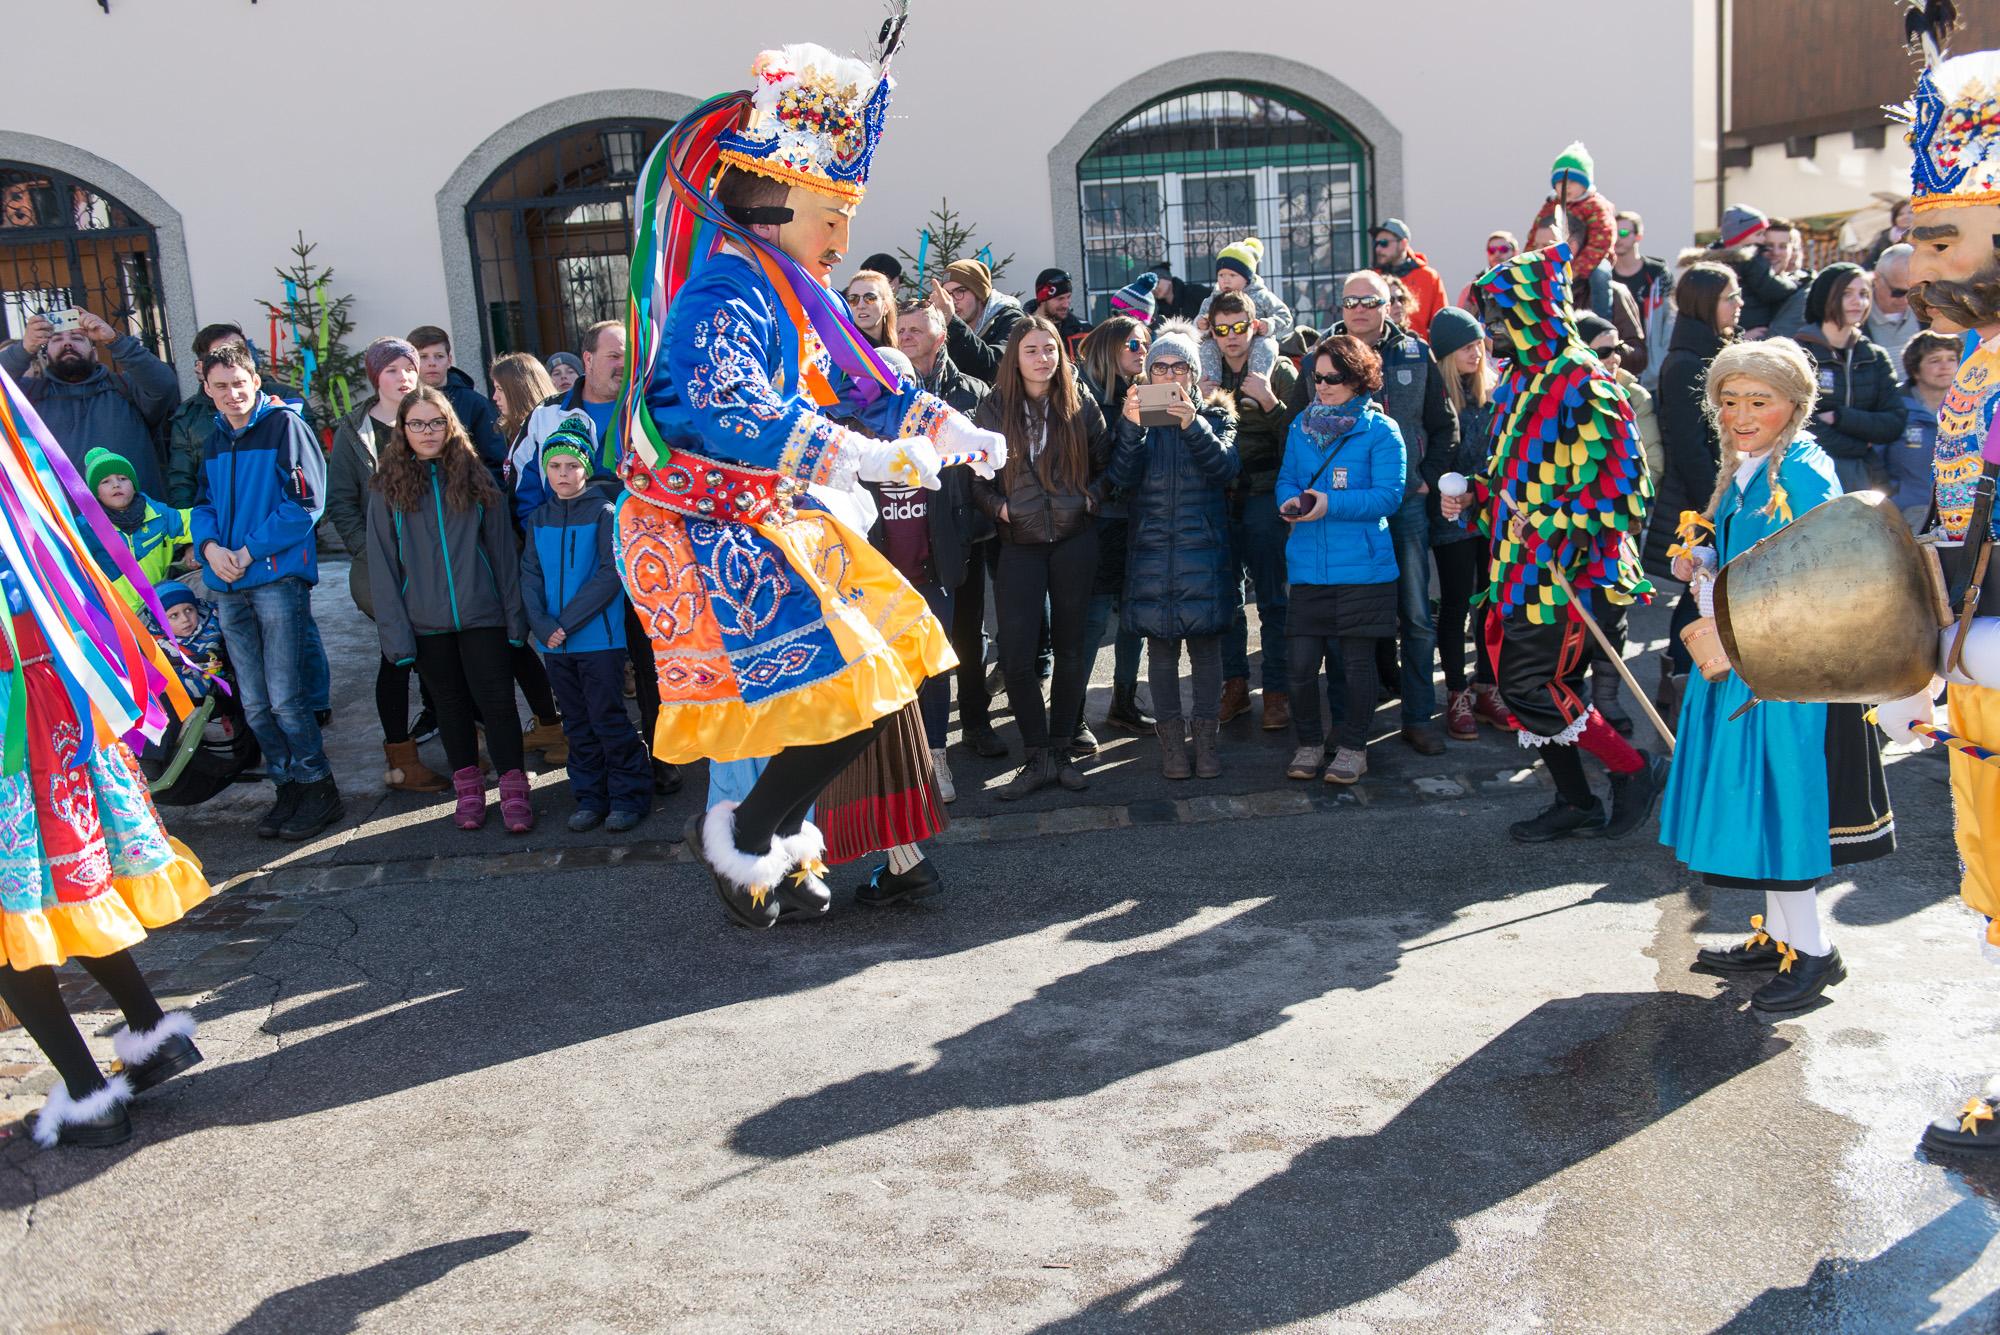 2019_Feb_Austria_Nassareith_Carnaval_1038.jpg